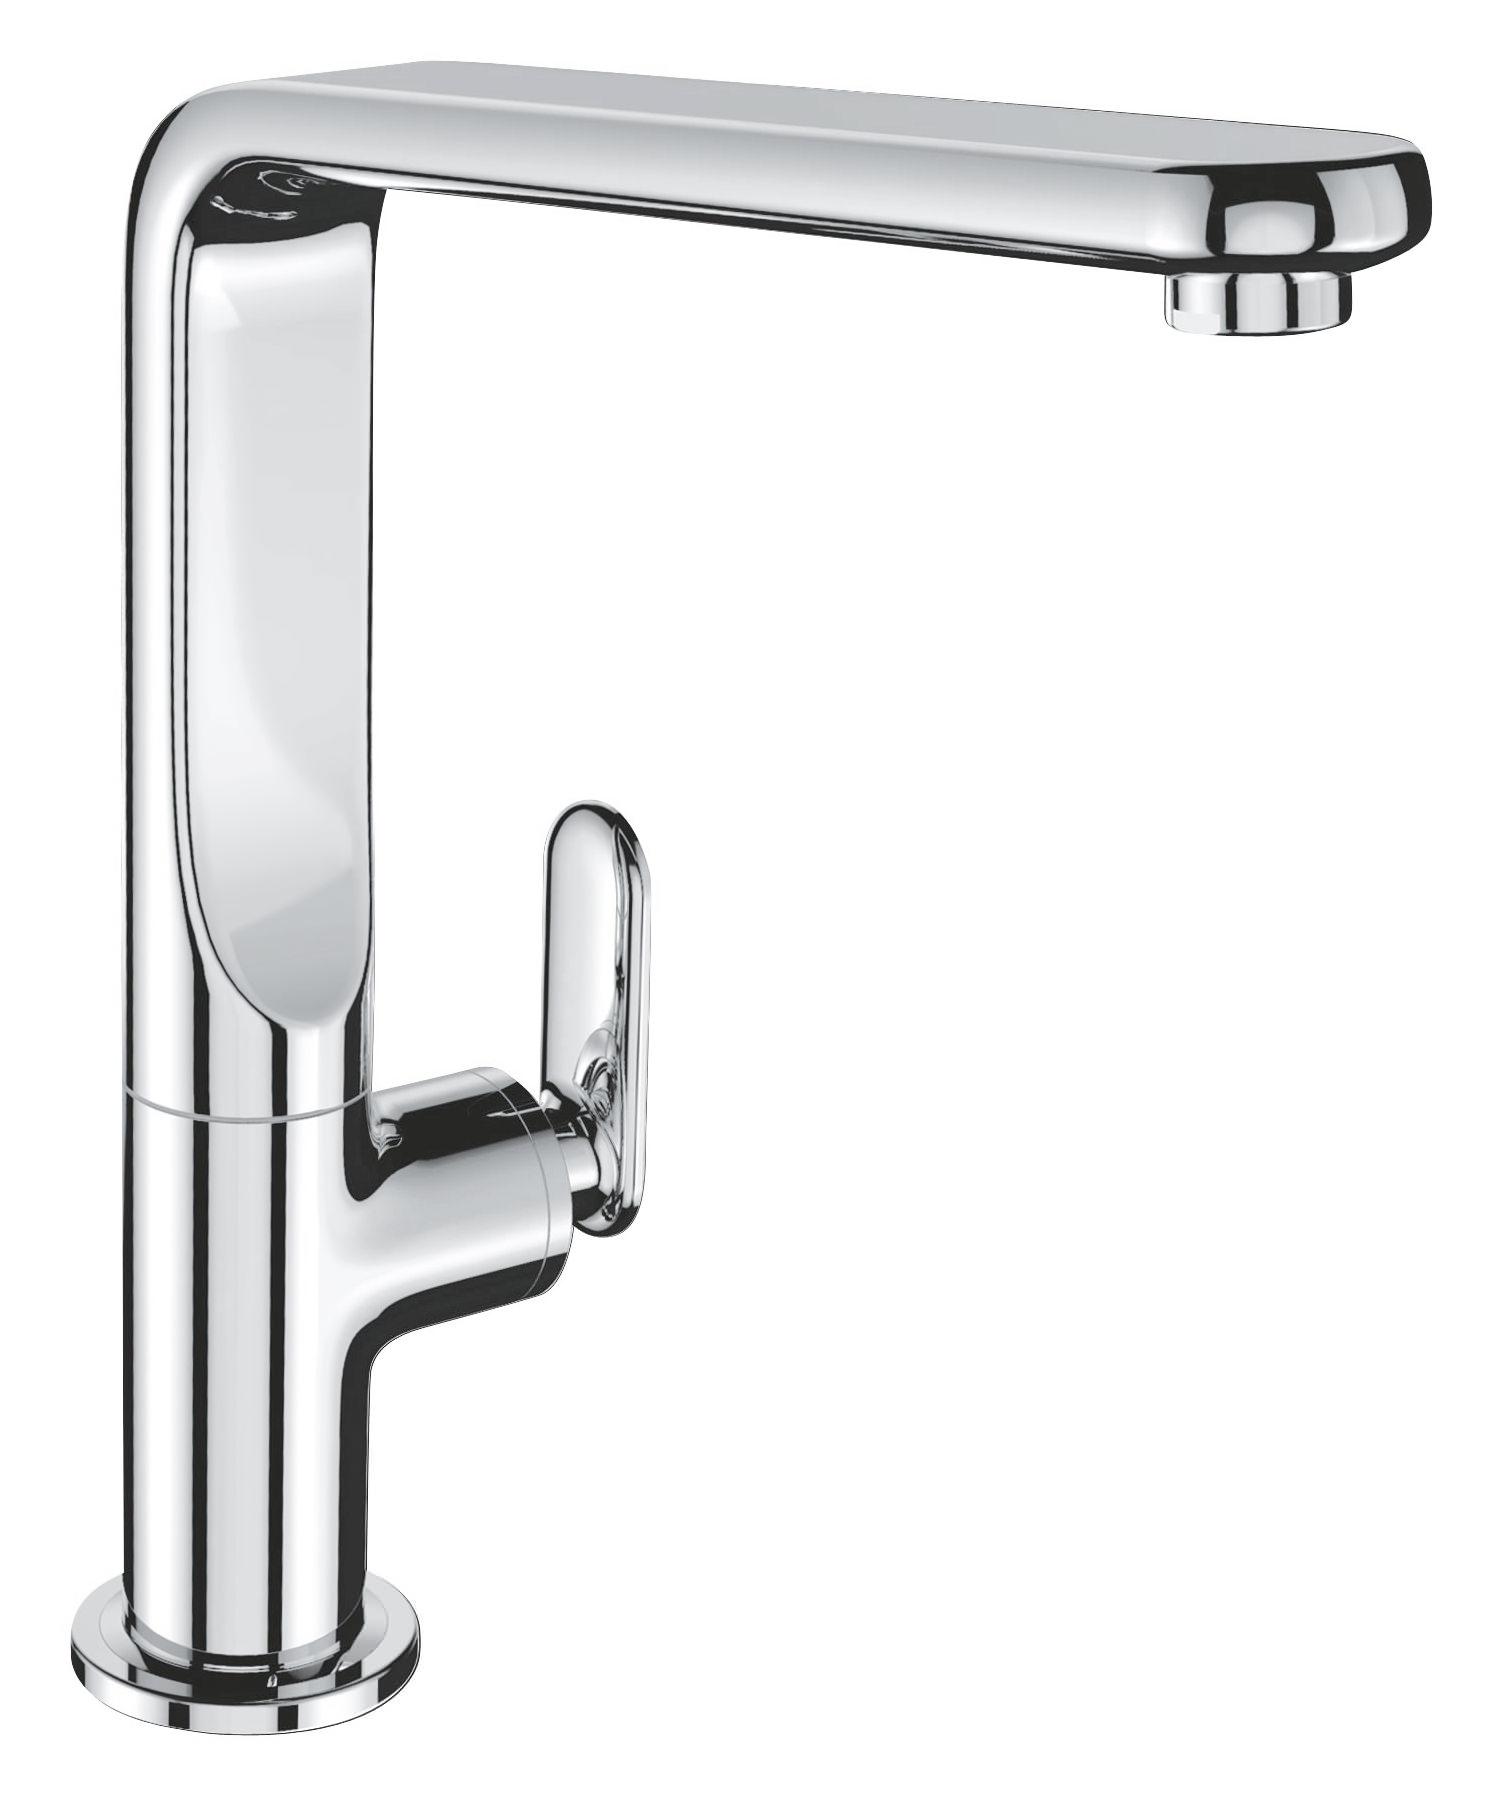 grohe veris monobloc chrome kitchen sink mixer tap 32198 000. Black Bedroom Furniture Sets. Home Design Ideas